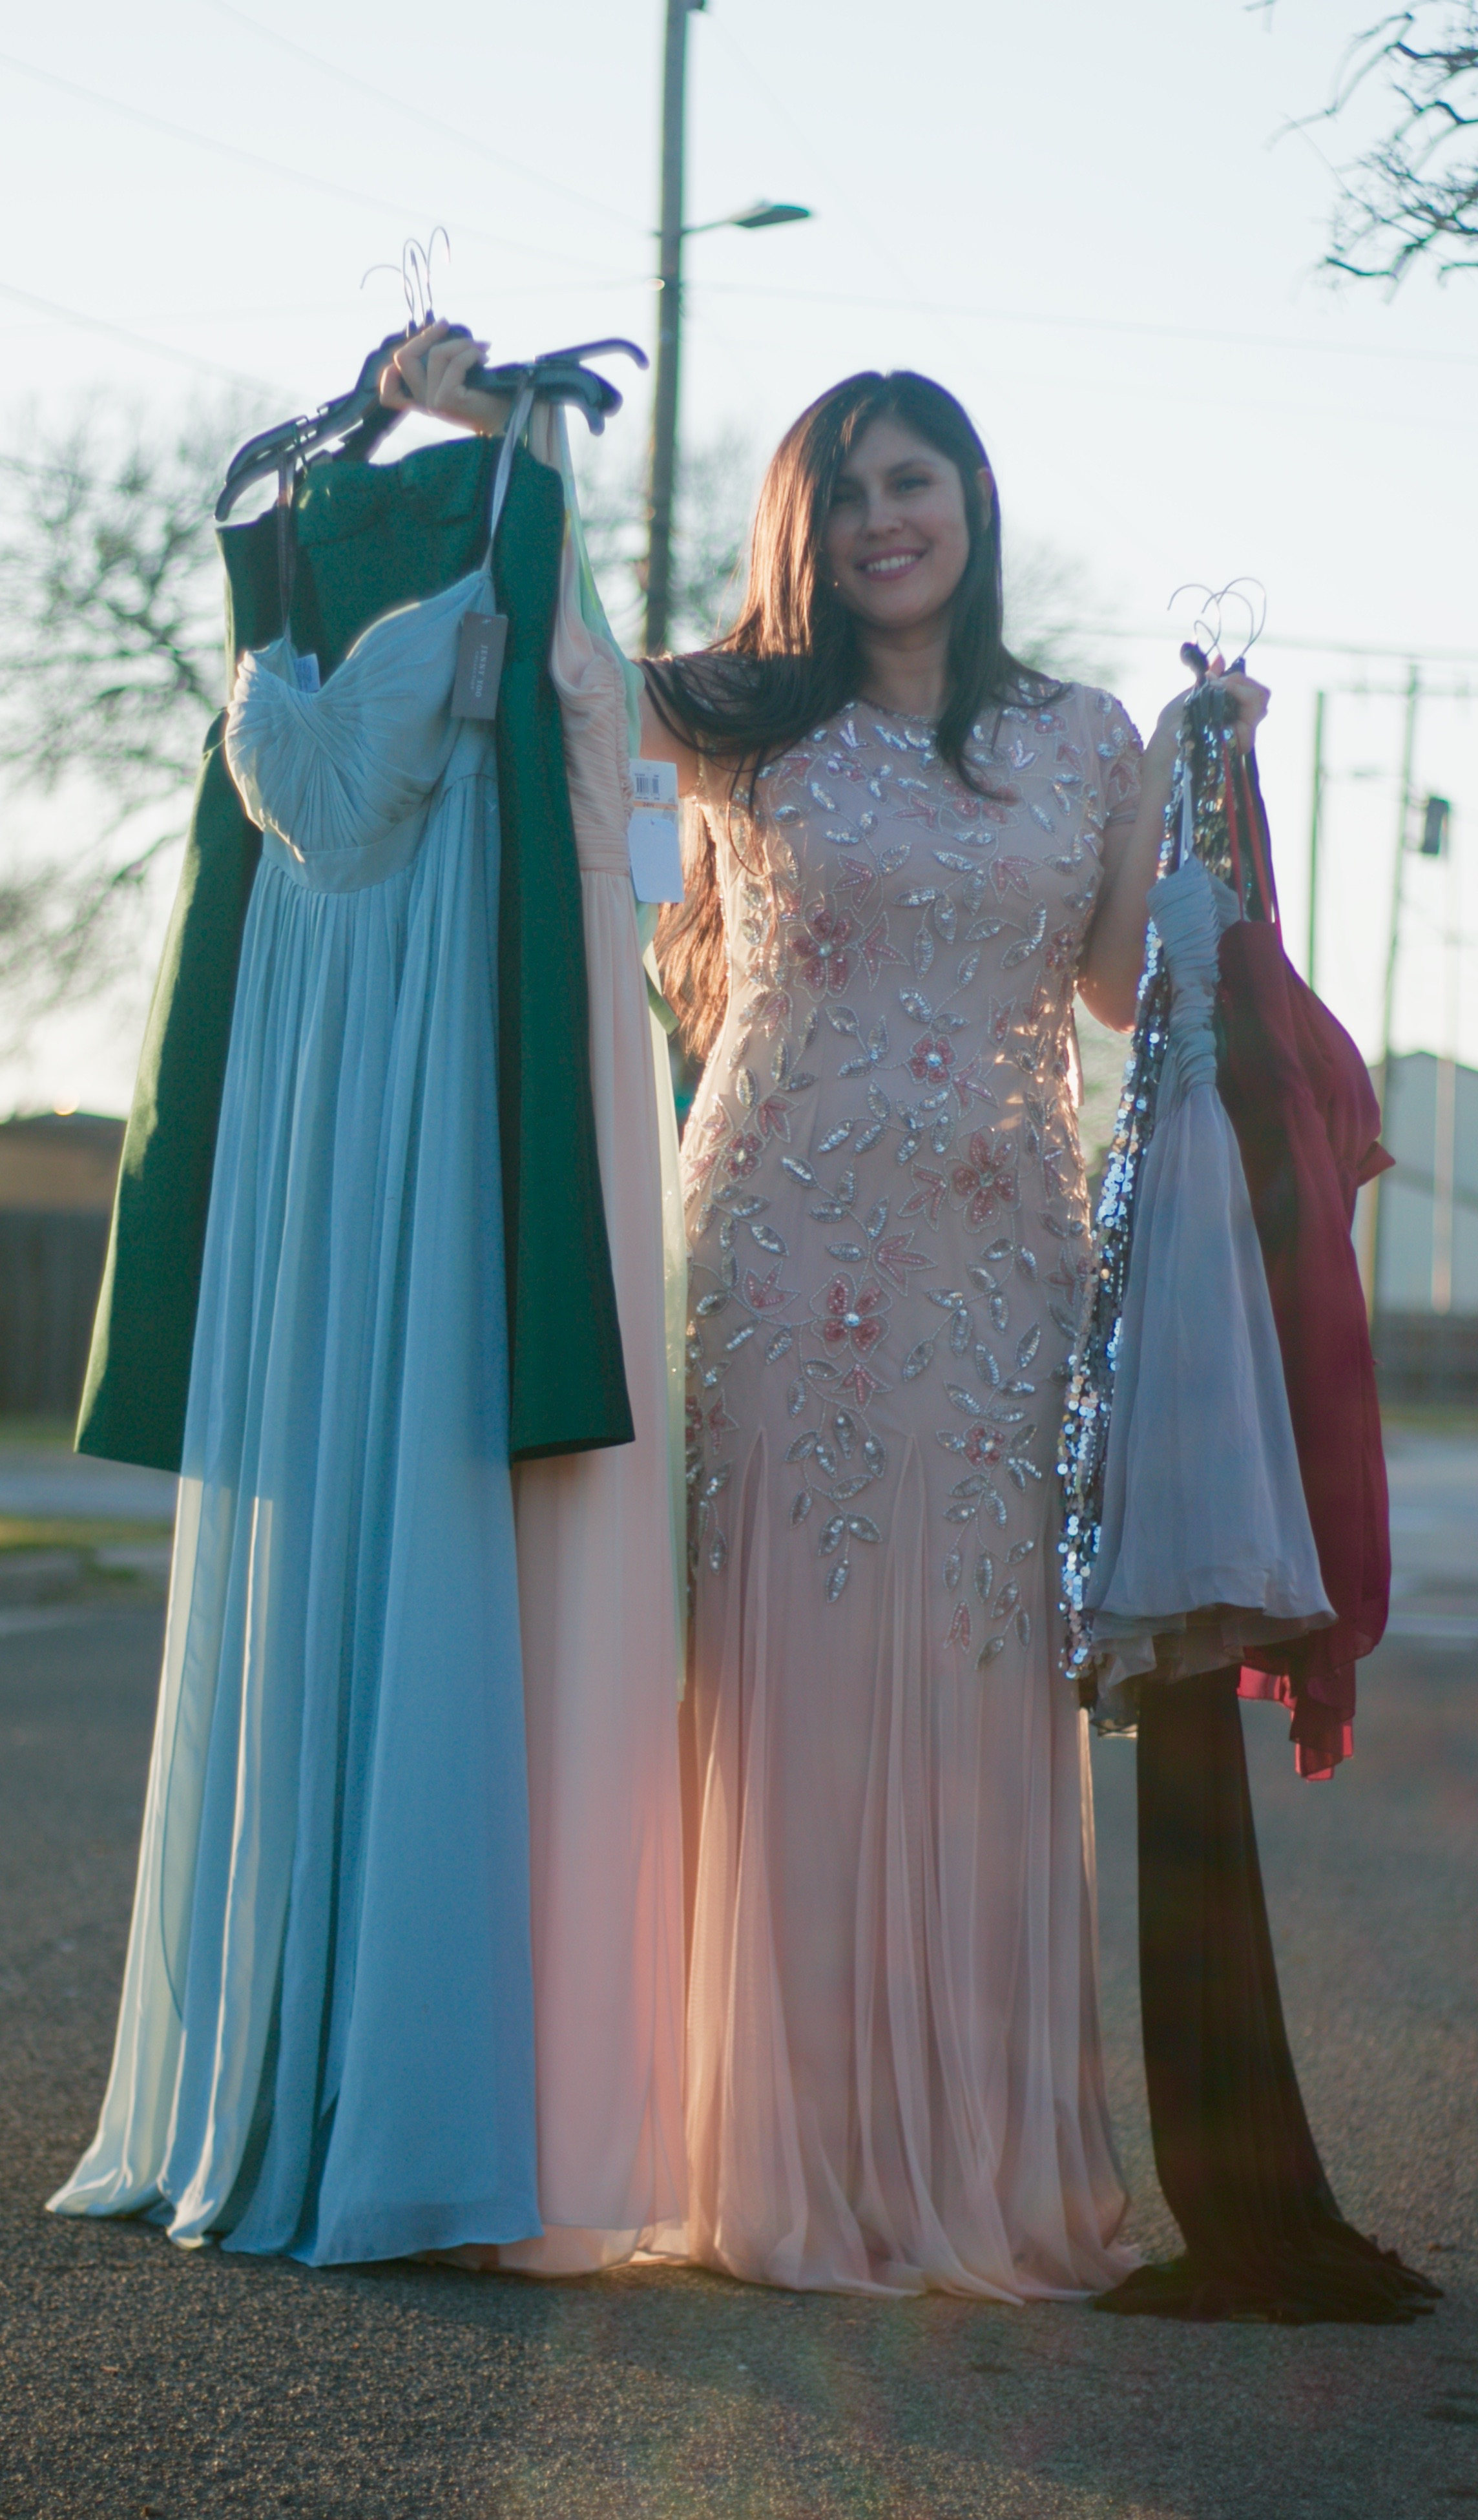 Dorable Prom Dresses At Nordstroms Festooning - All Wedding Dresses ...